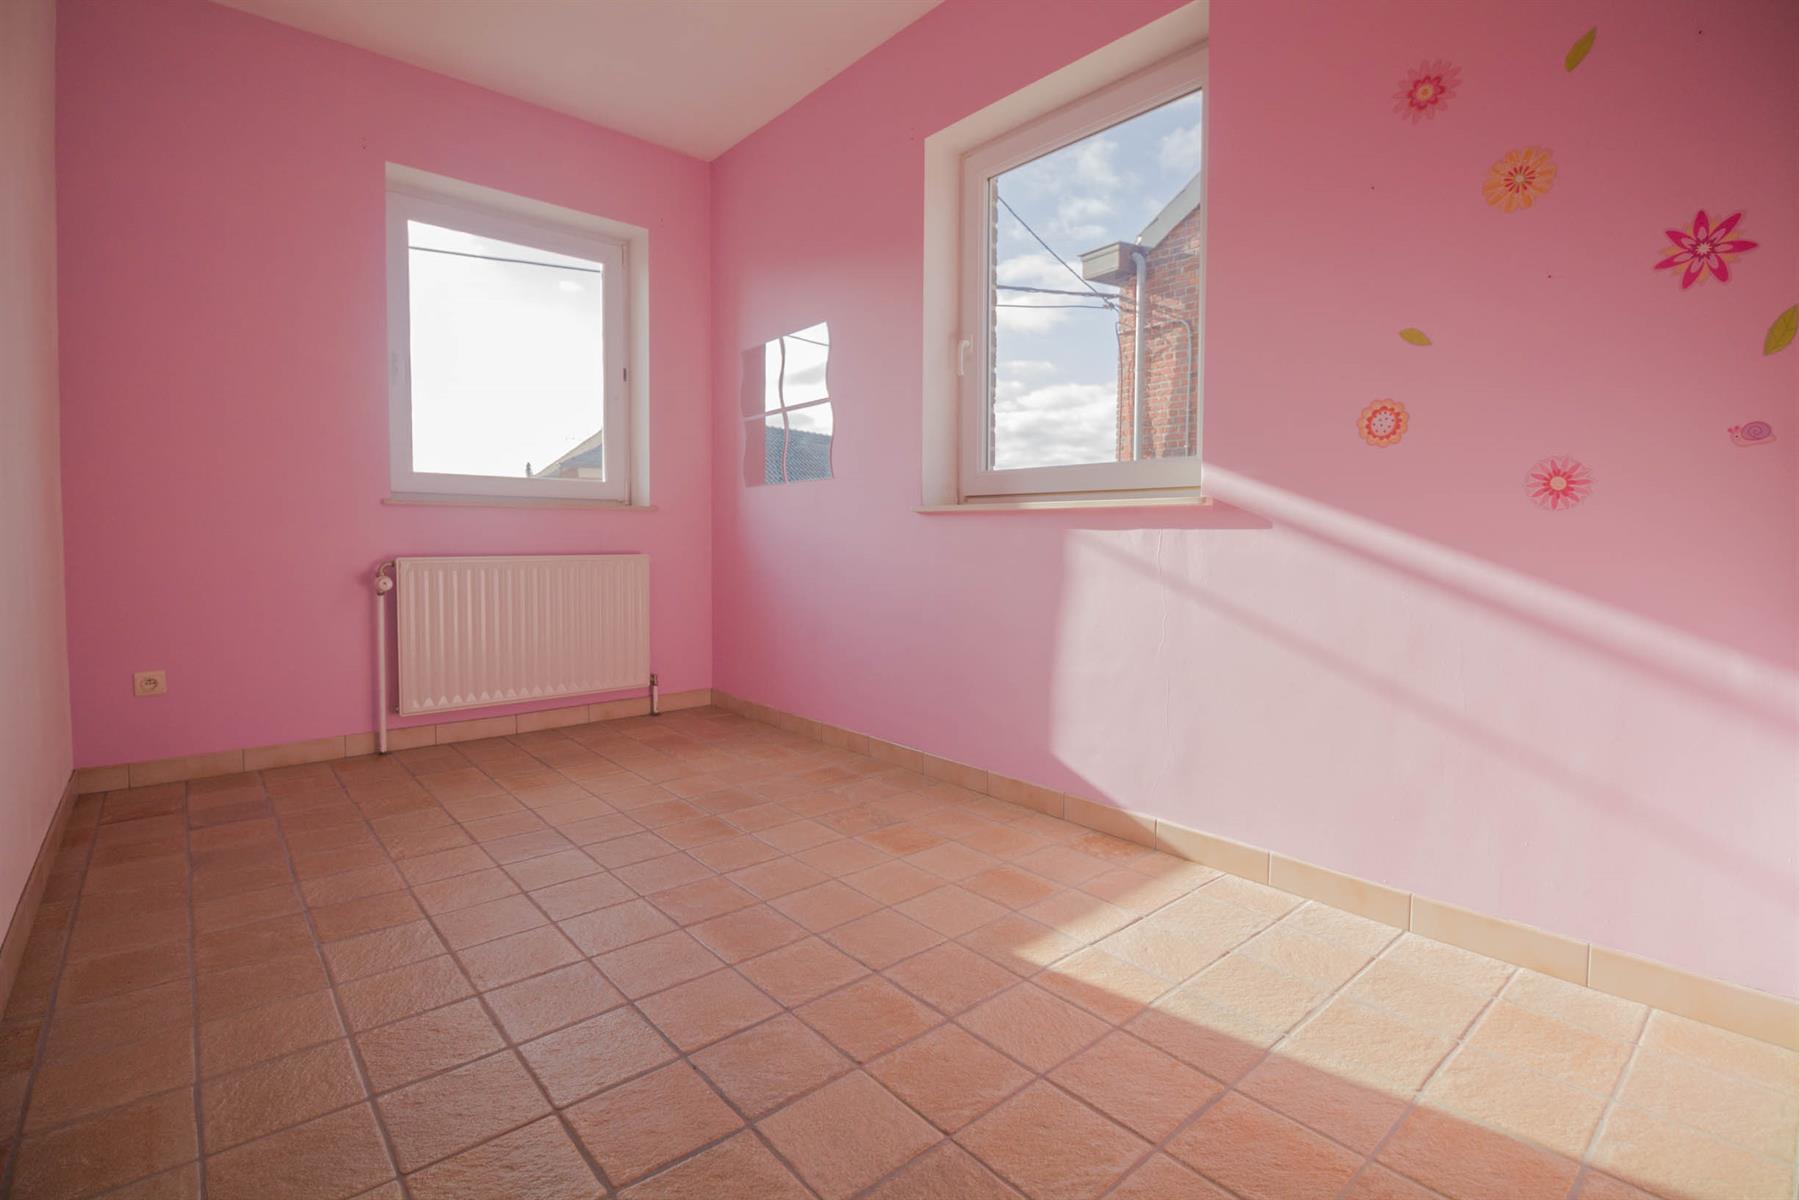 Appartement - Courcelles - #4226901-13